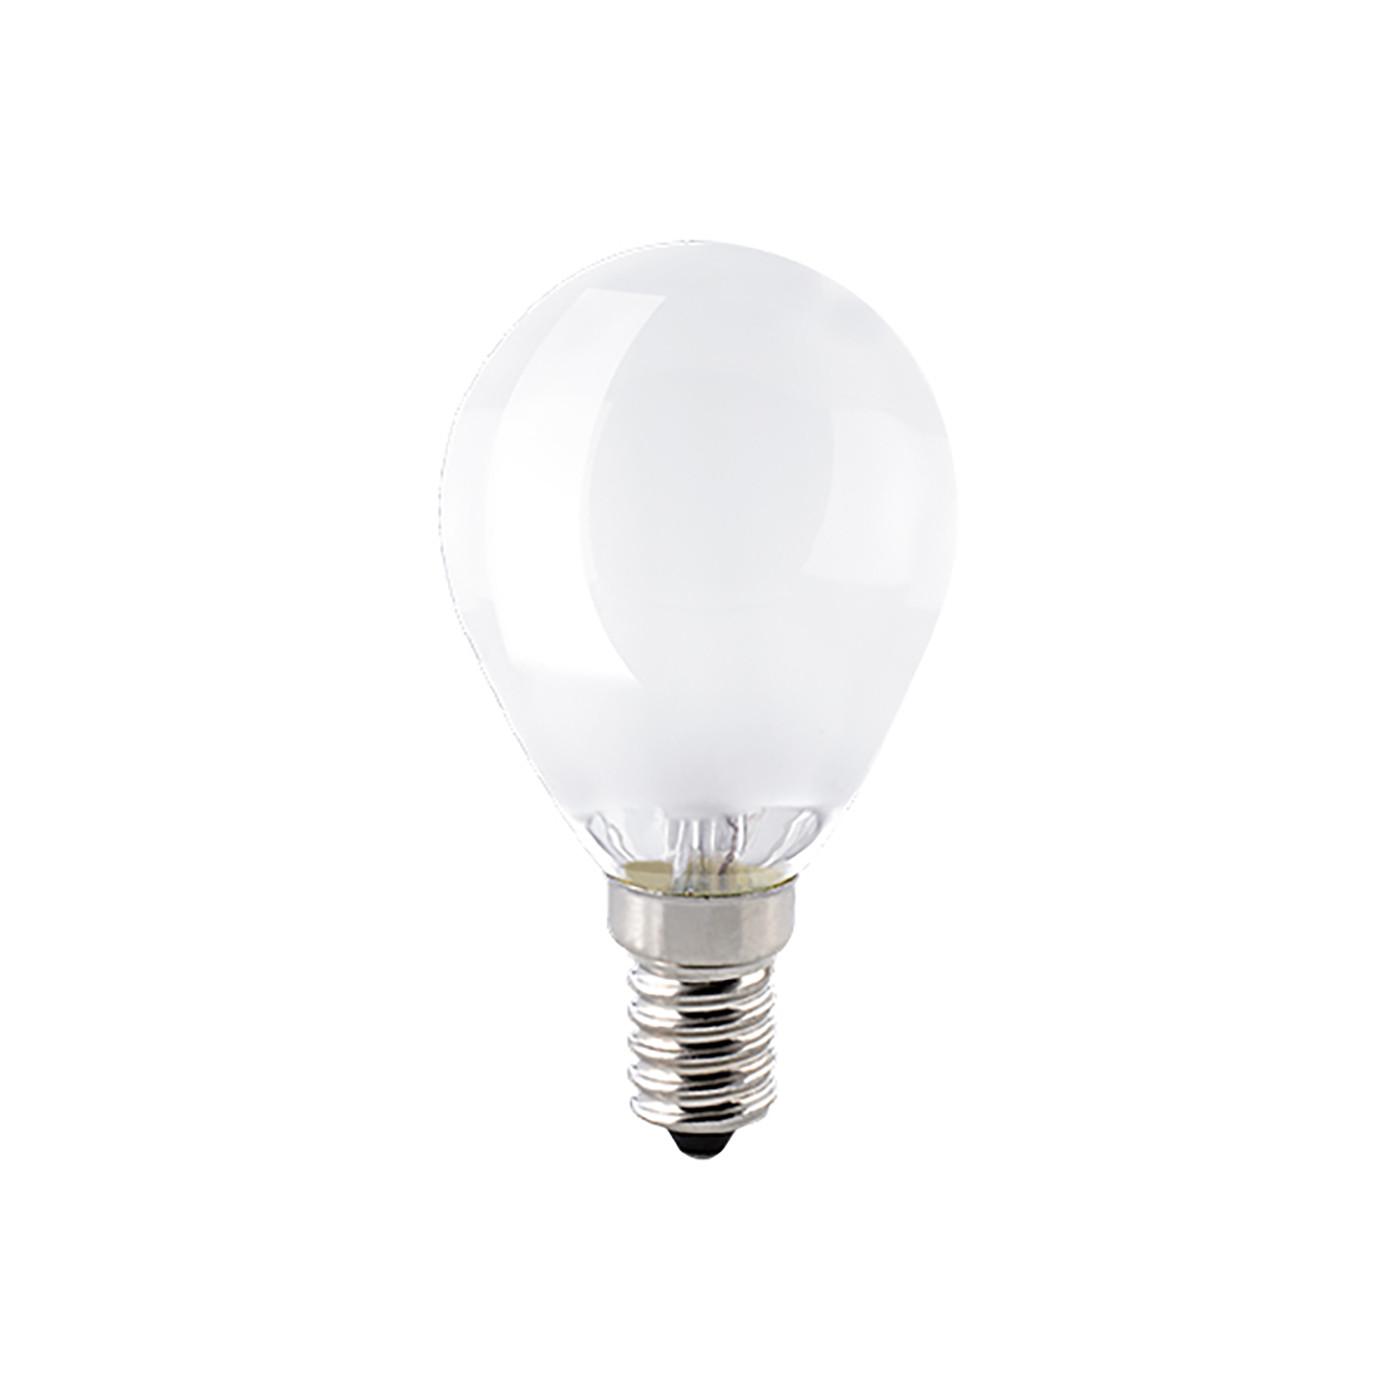 Sigor LED-Filament-Kugellampe P45 4,5W 2700K 230V E14 matt